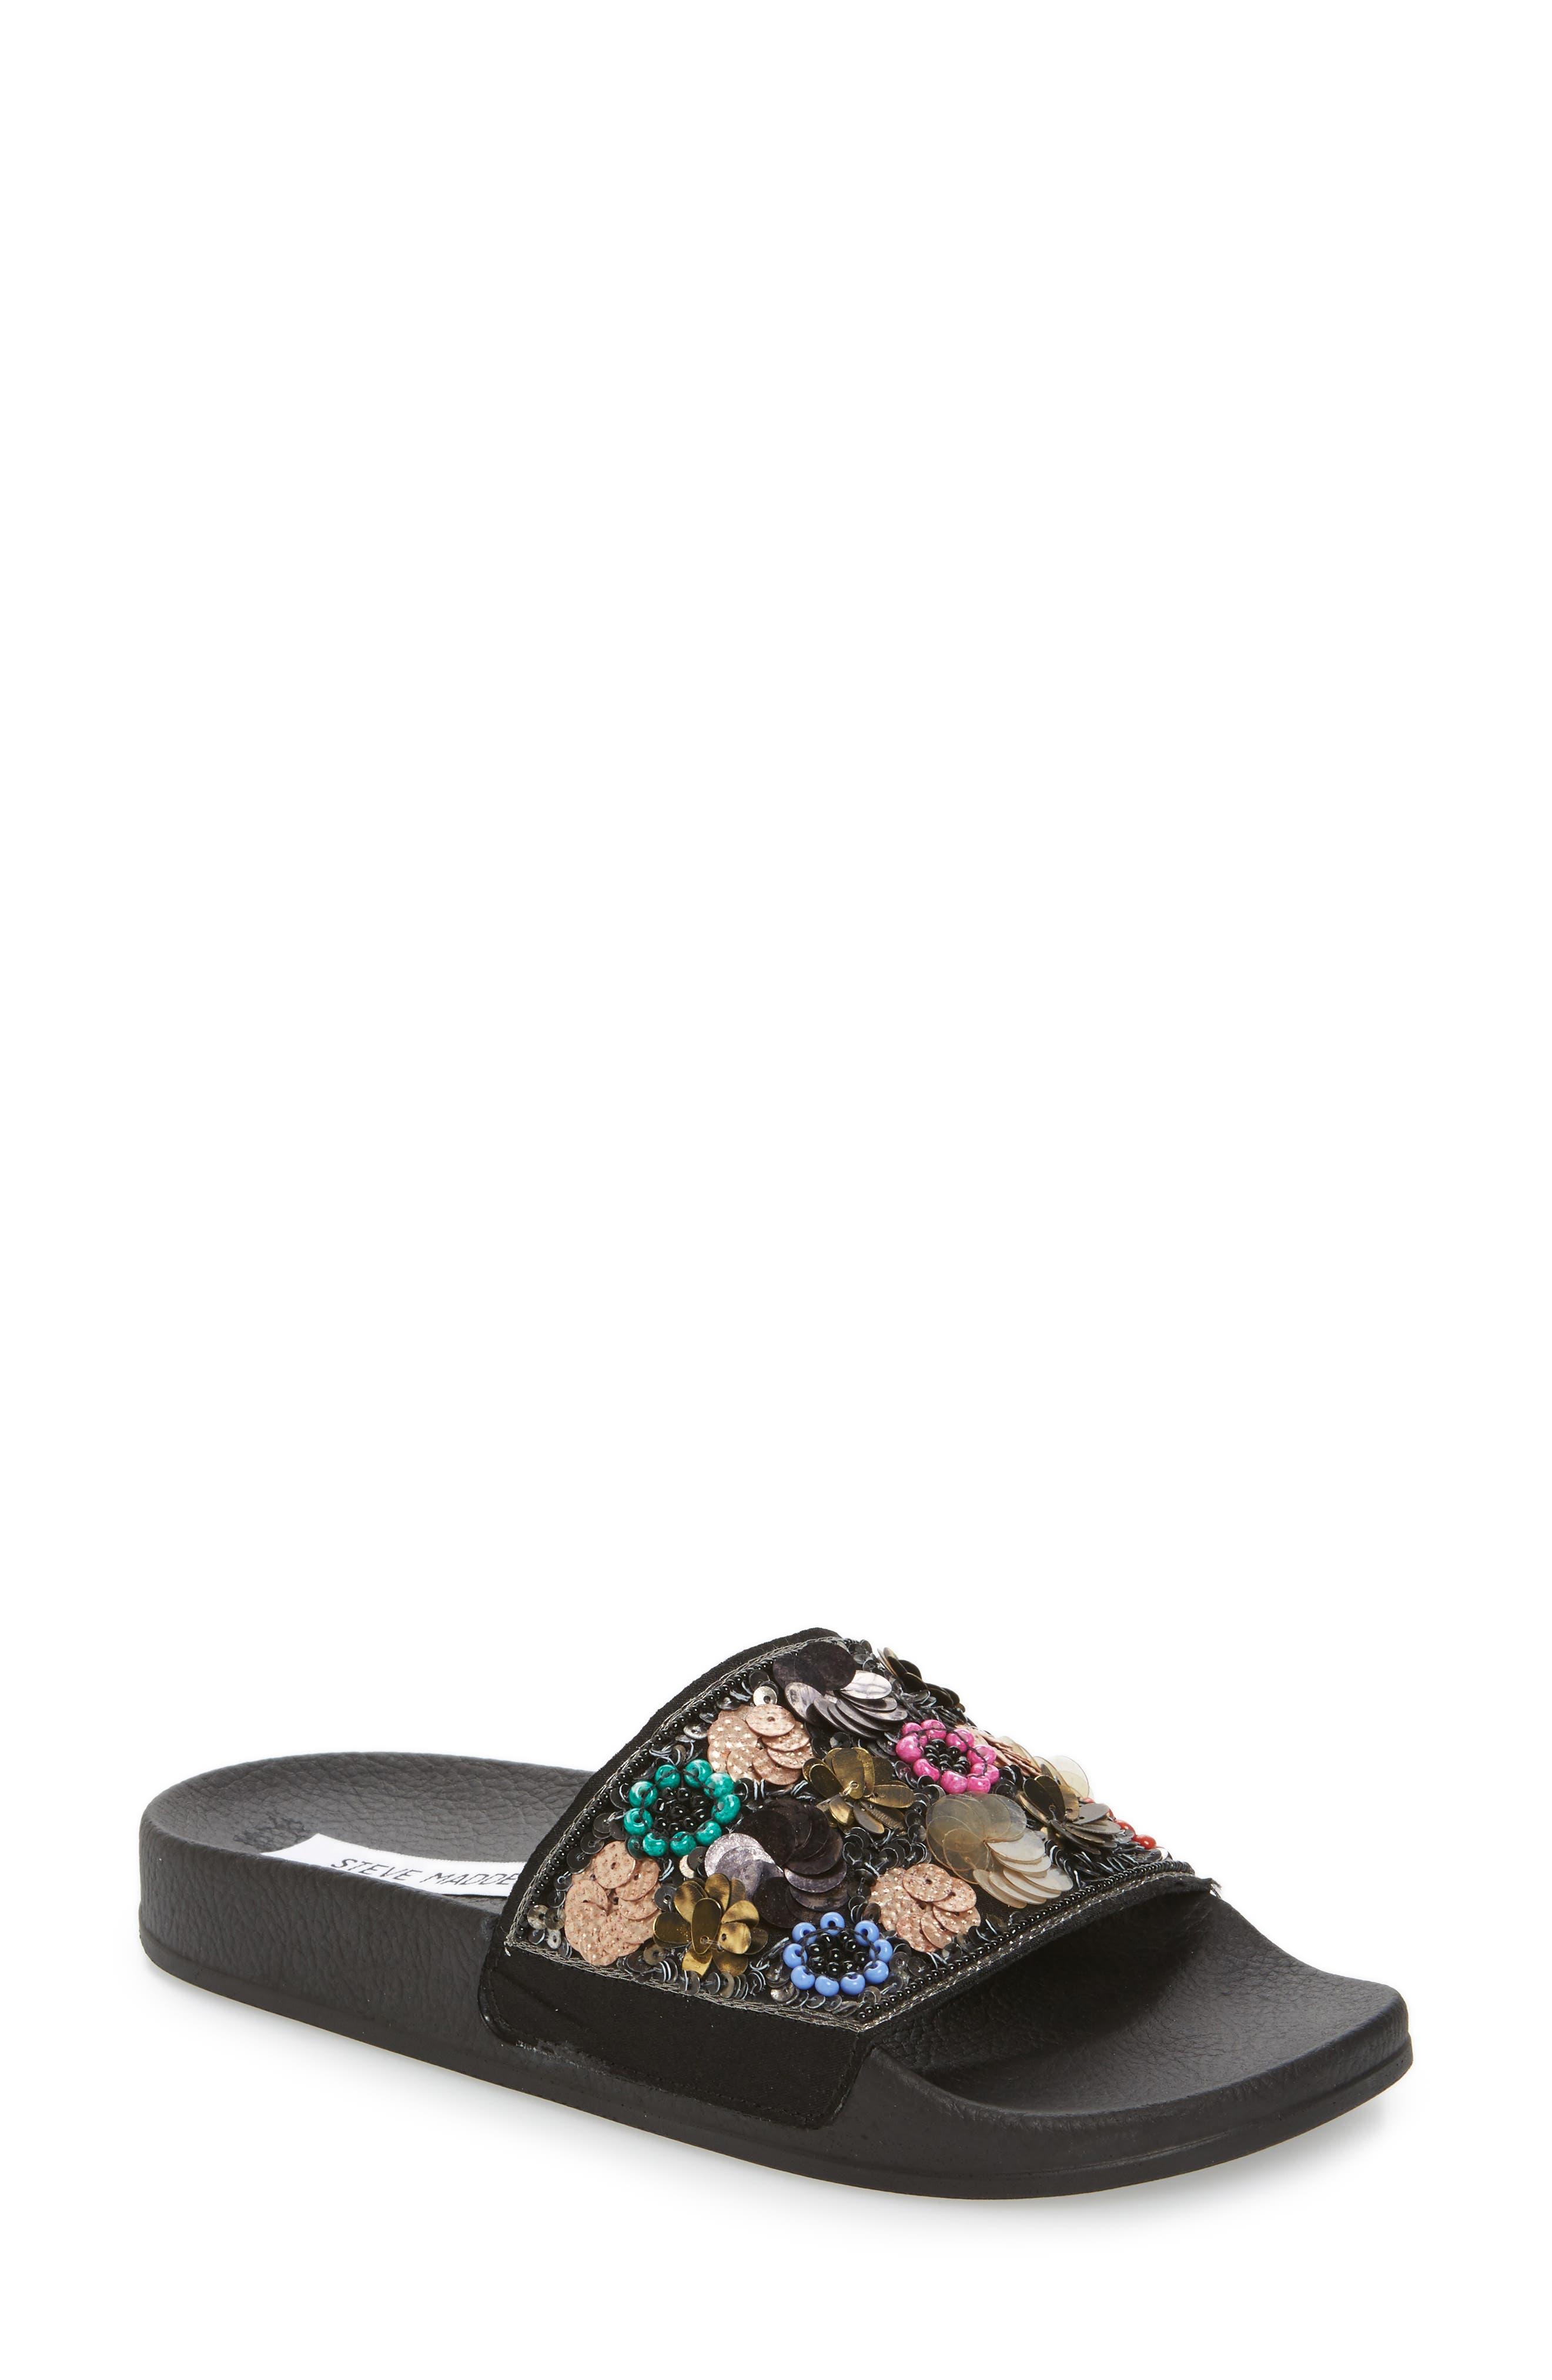 Maddy Embellished Slide Sandal,                             Main thumbnail 1, color,                             Flower Multi